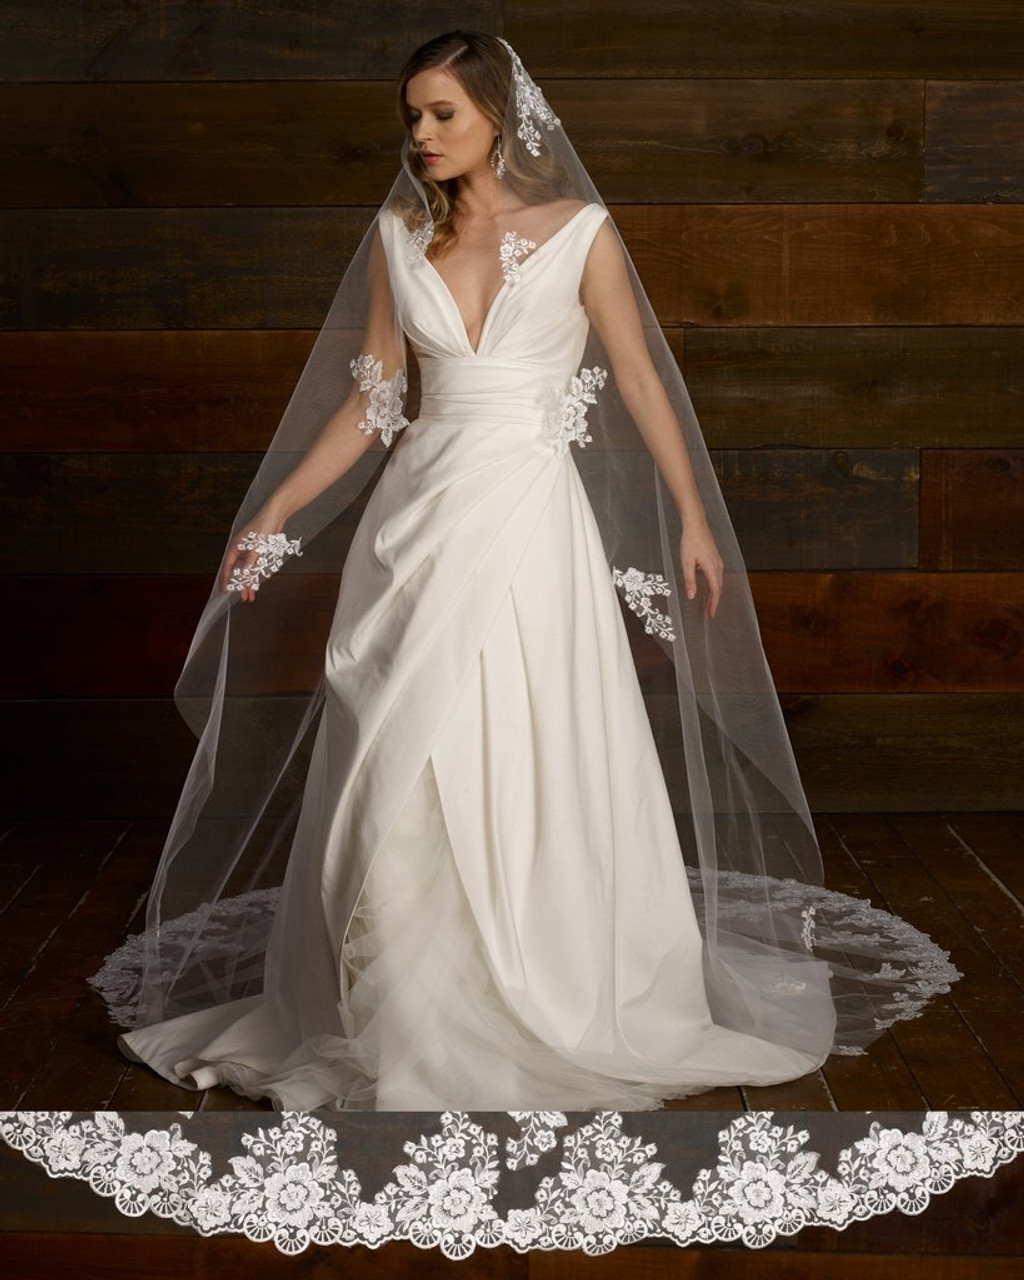 "Marionat Bridal Veils  3787 - 120"" Long  - Beaded lace mantilla with lace appliques"